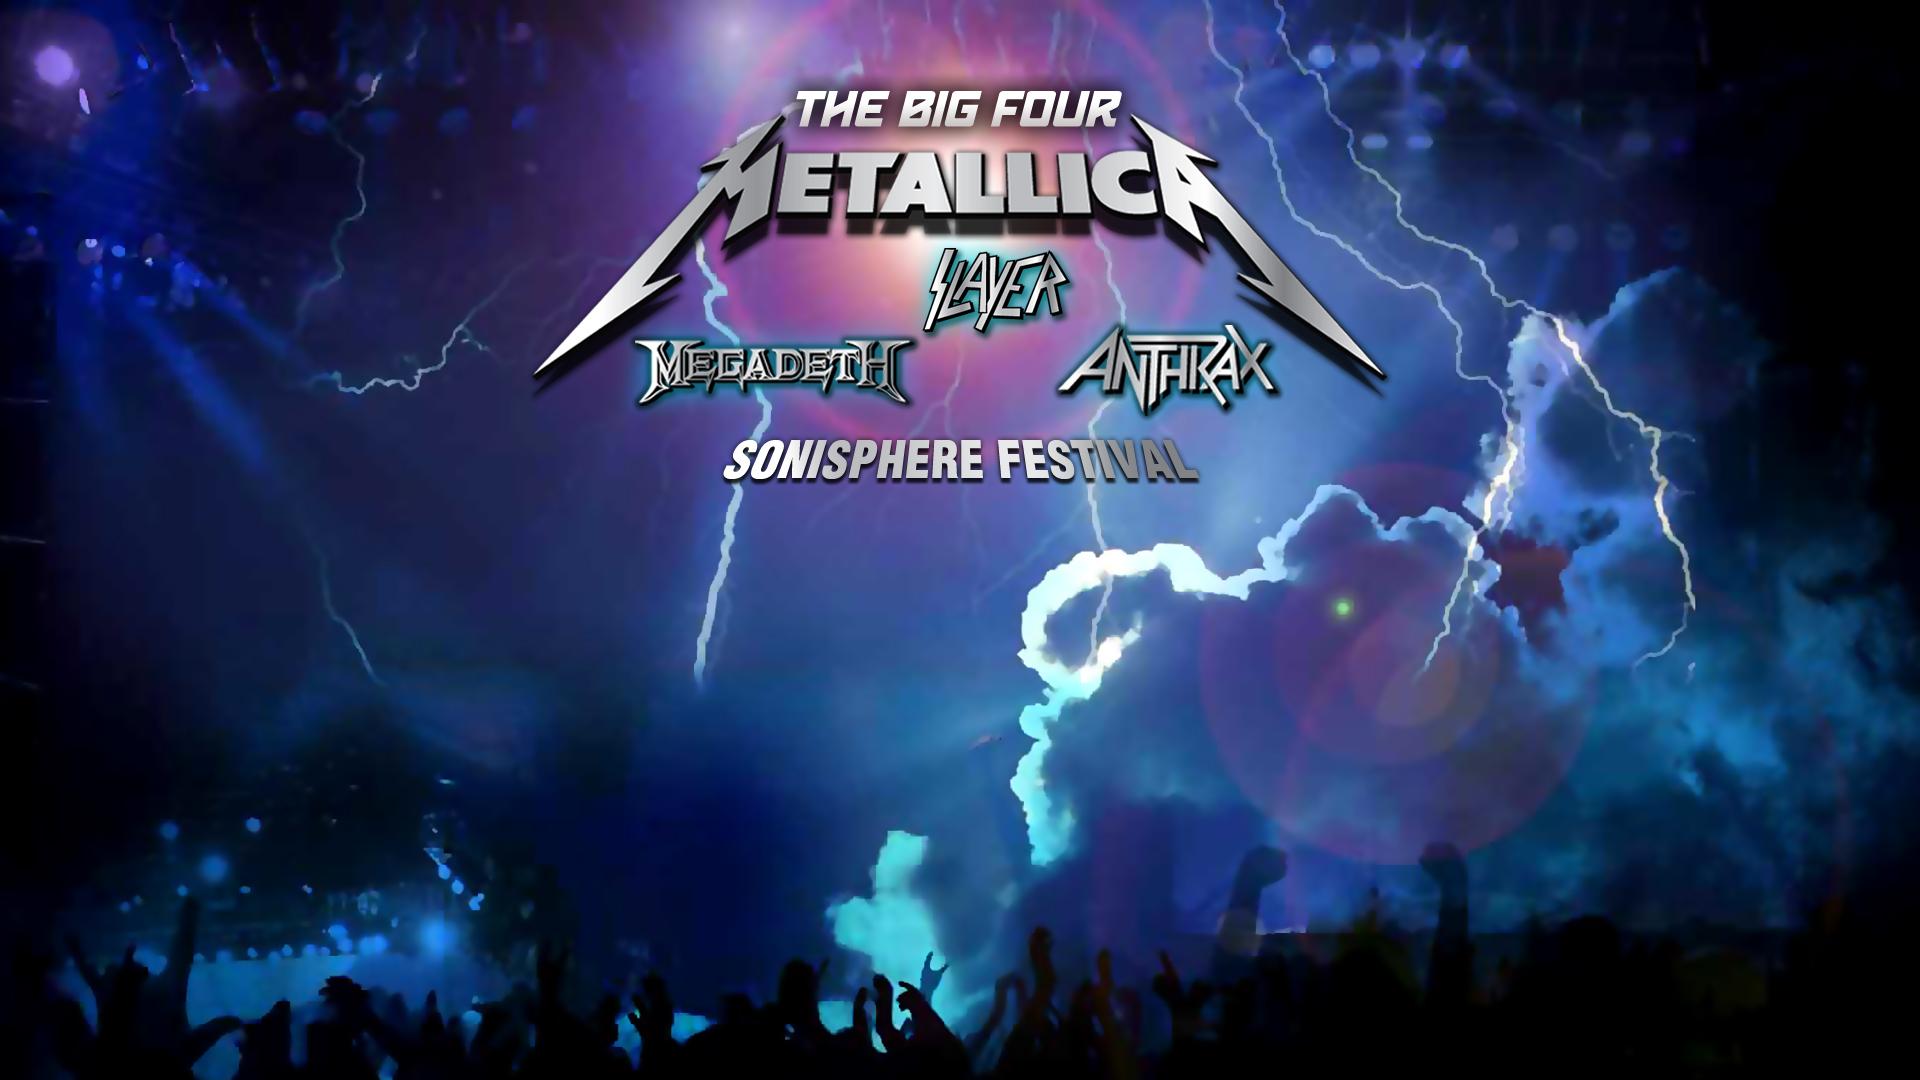 48] Anthrax Band Full Concert Wallpaper on WallpaperSafari 1920x1080